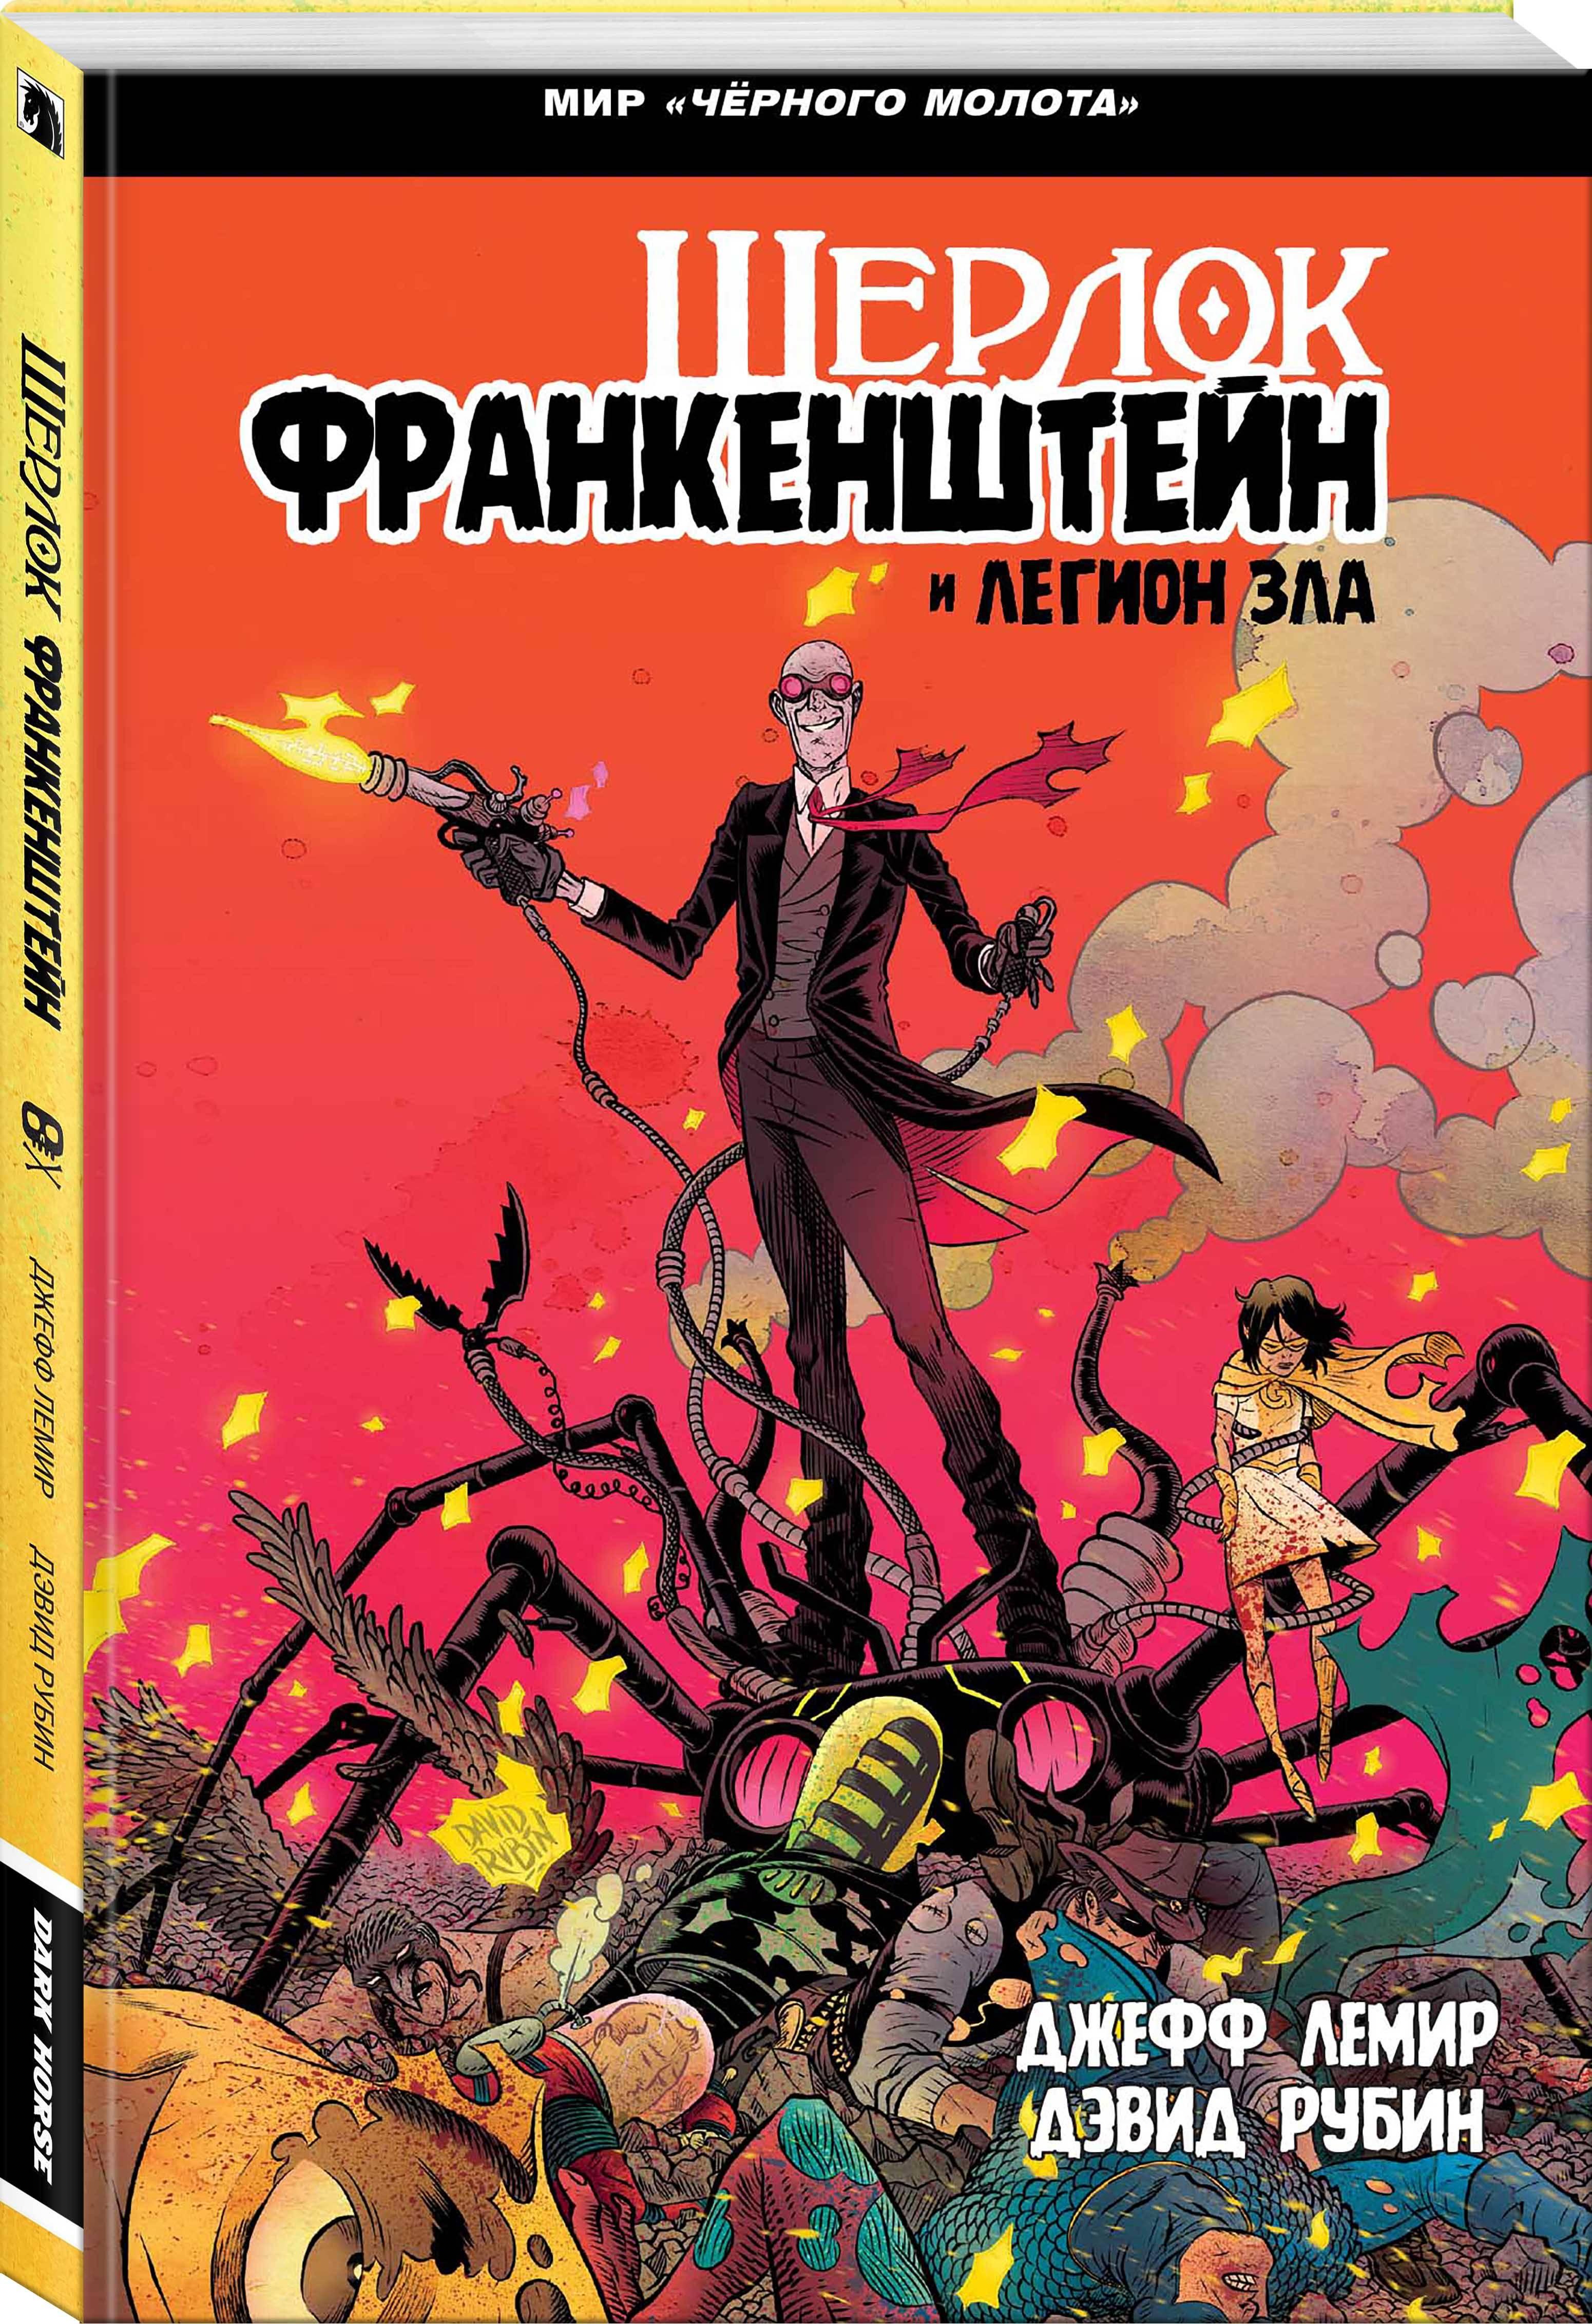 Лемир Д. Черный Молот: Шерлок Франкенштейн и Легион Зла